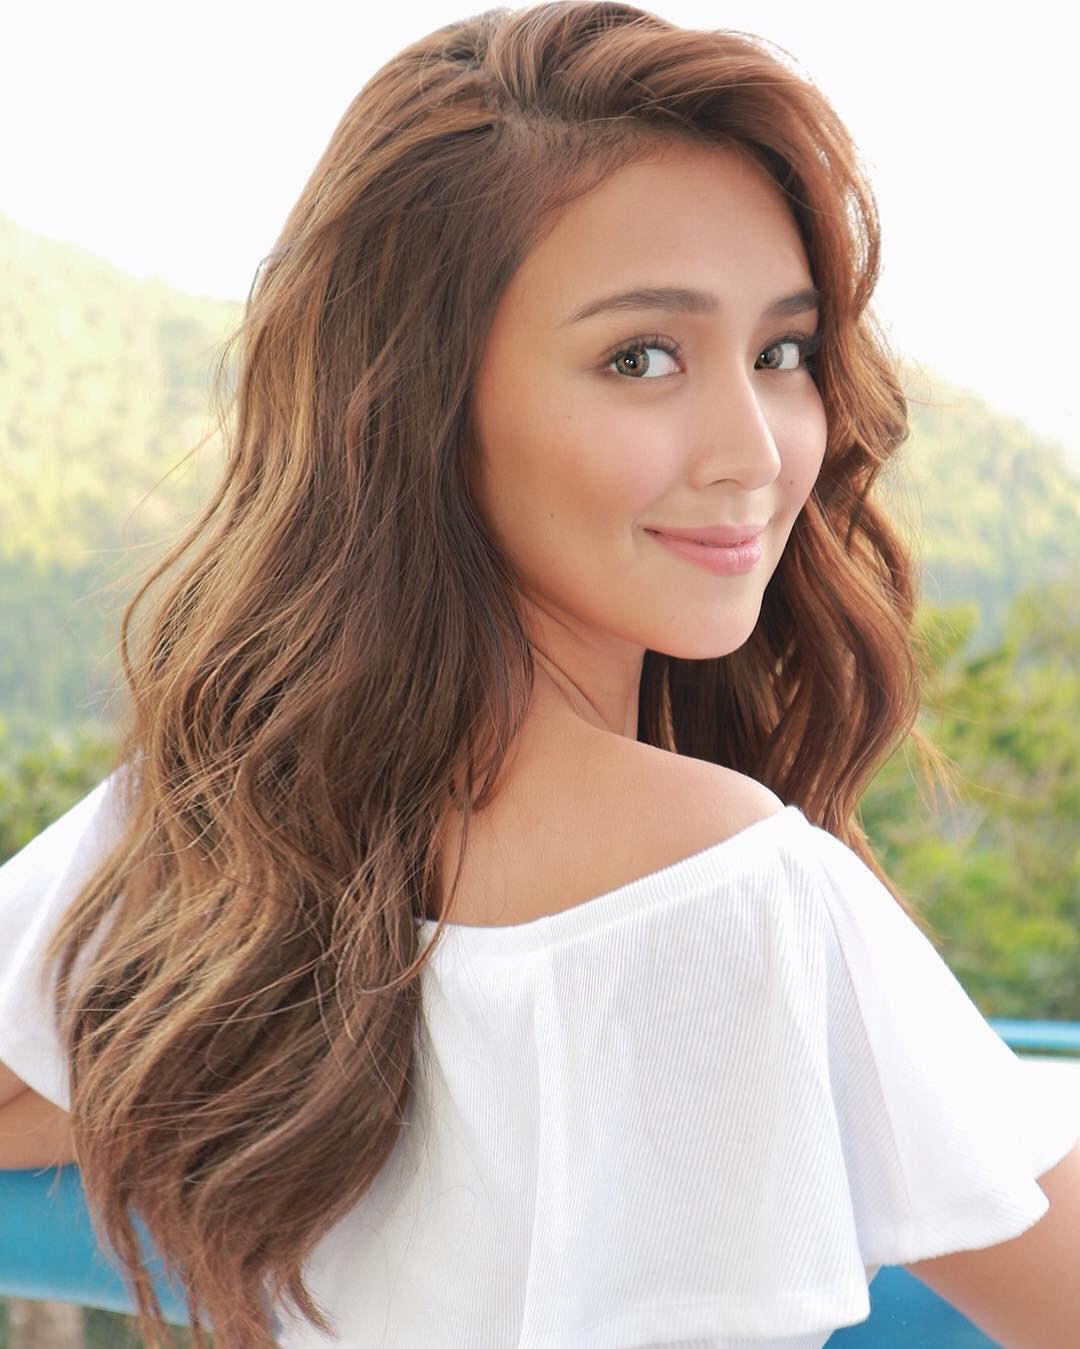 Kathrynbernardo Hair Color Asian Hair Color For Morena Hair Color For Brown Skin